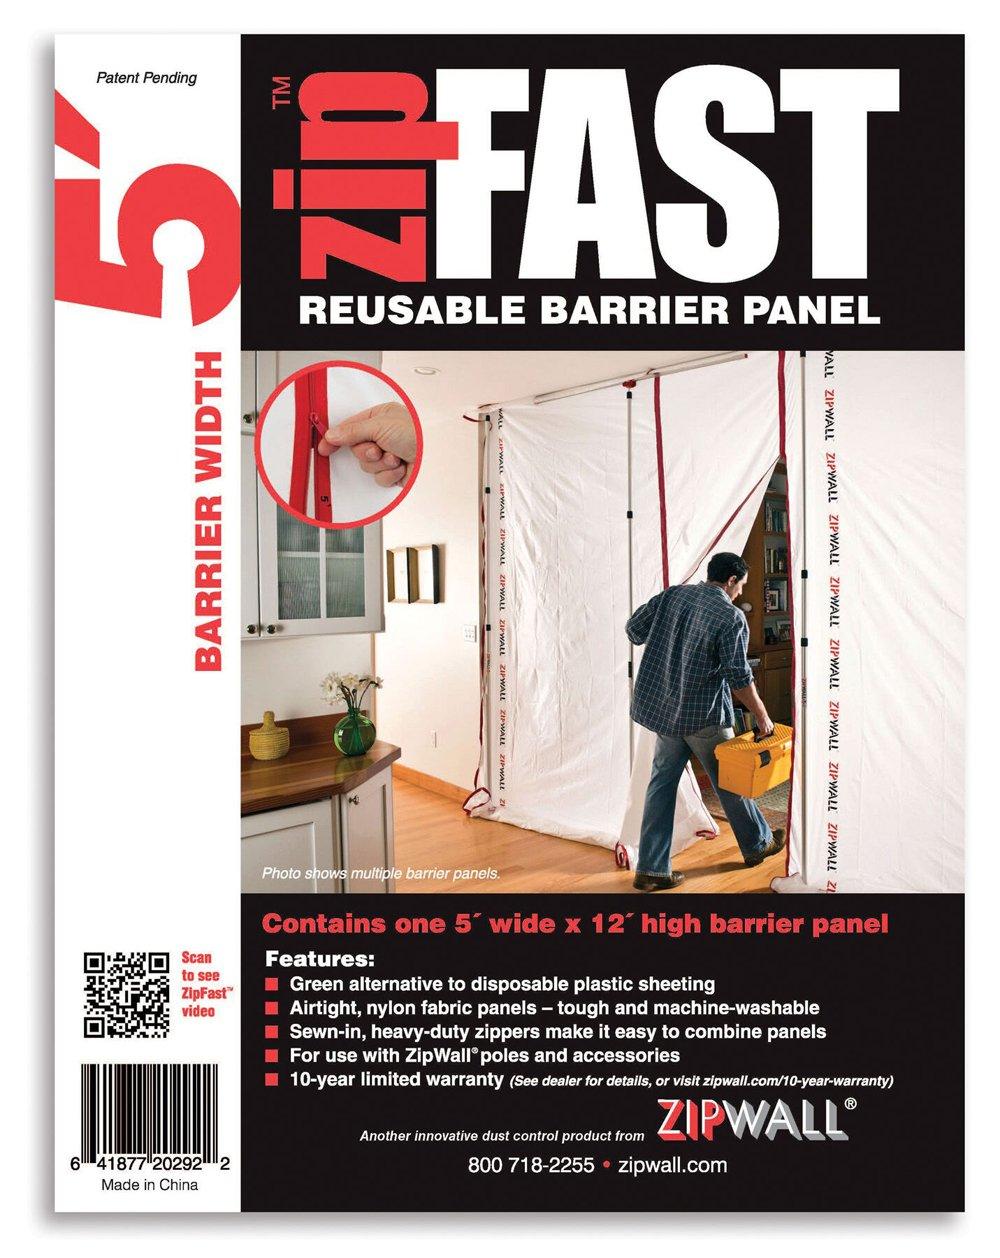 ZipWall ZipFast Reusable Barrier 5' Panel for Dust Barriers,  4-Pack, ZF5-PK4